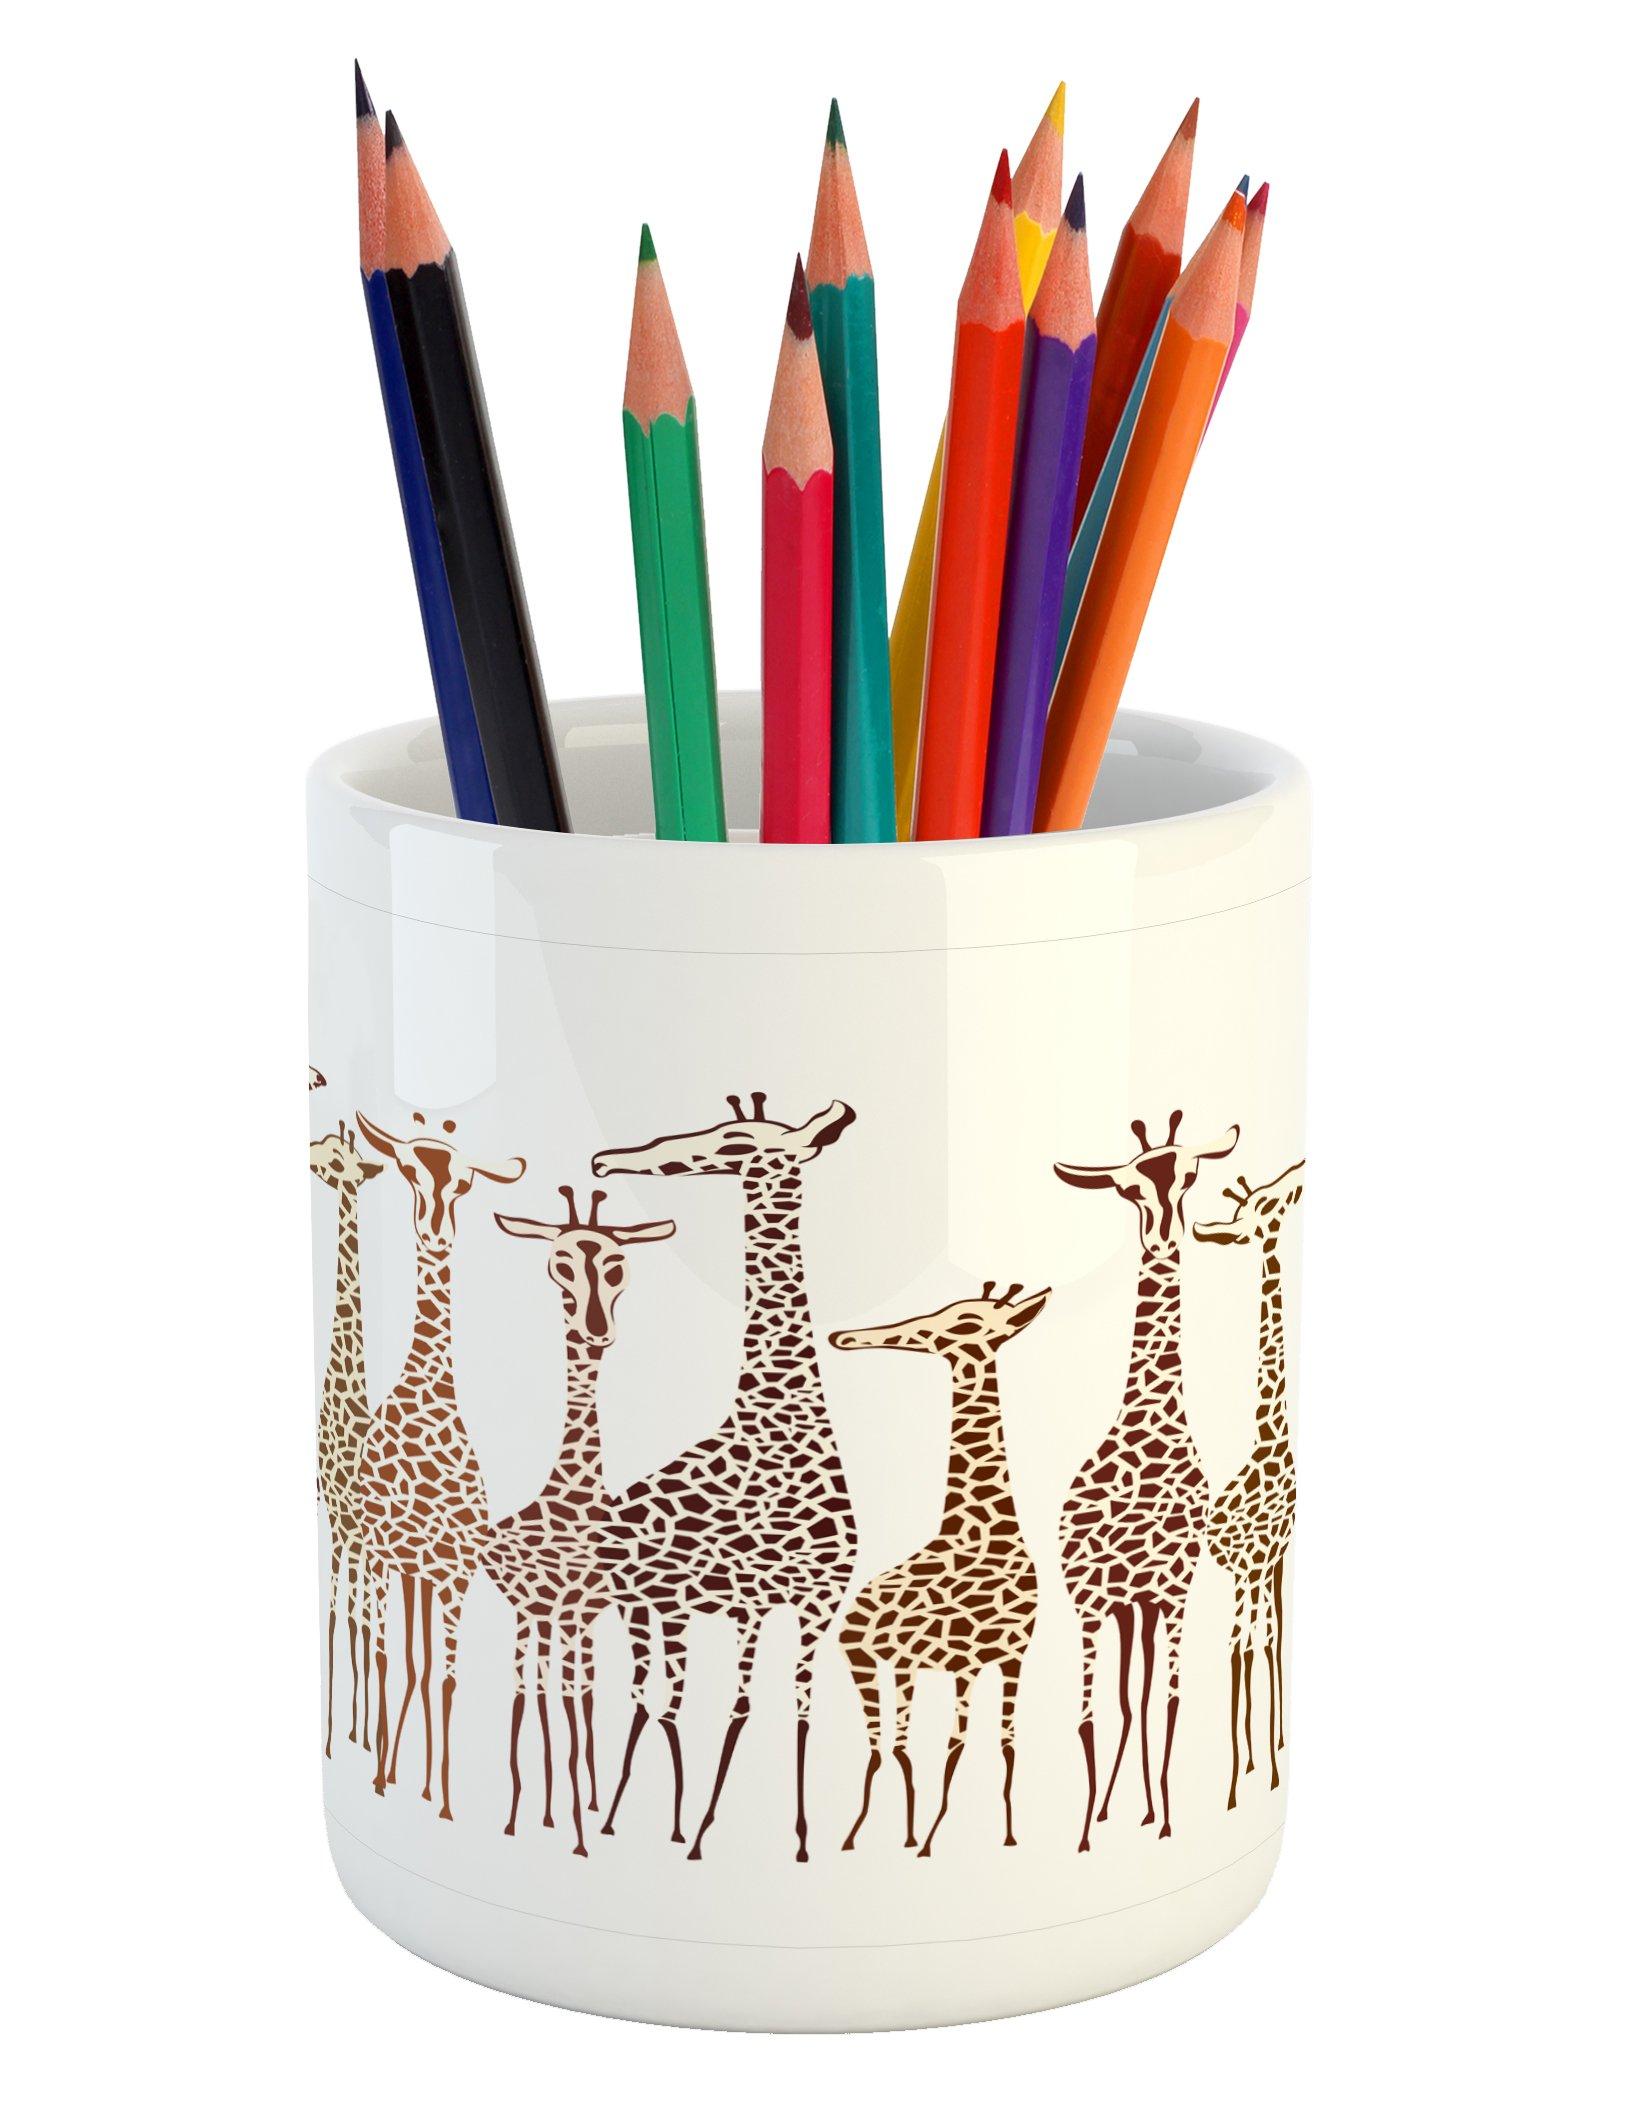 Lunarable Safari Pencil Pen Holder, Tropical Giraffes Exotic Climates Wilderness Savannah Animals Artful Illustration, Printed Ceramic Pencil Pen Holder for Desk Office Accessory, Multicolor by Lunarable